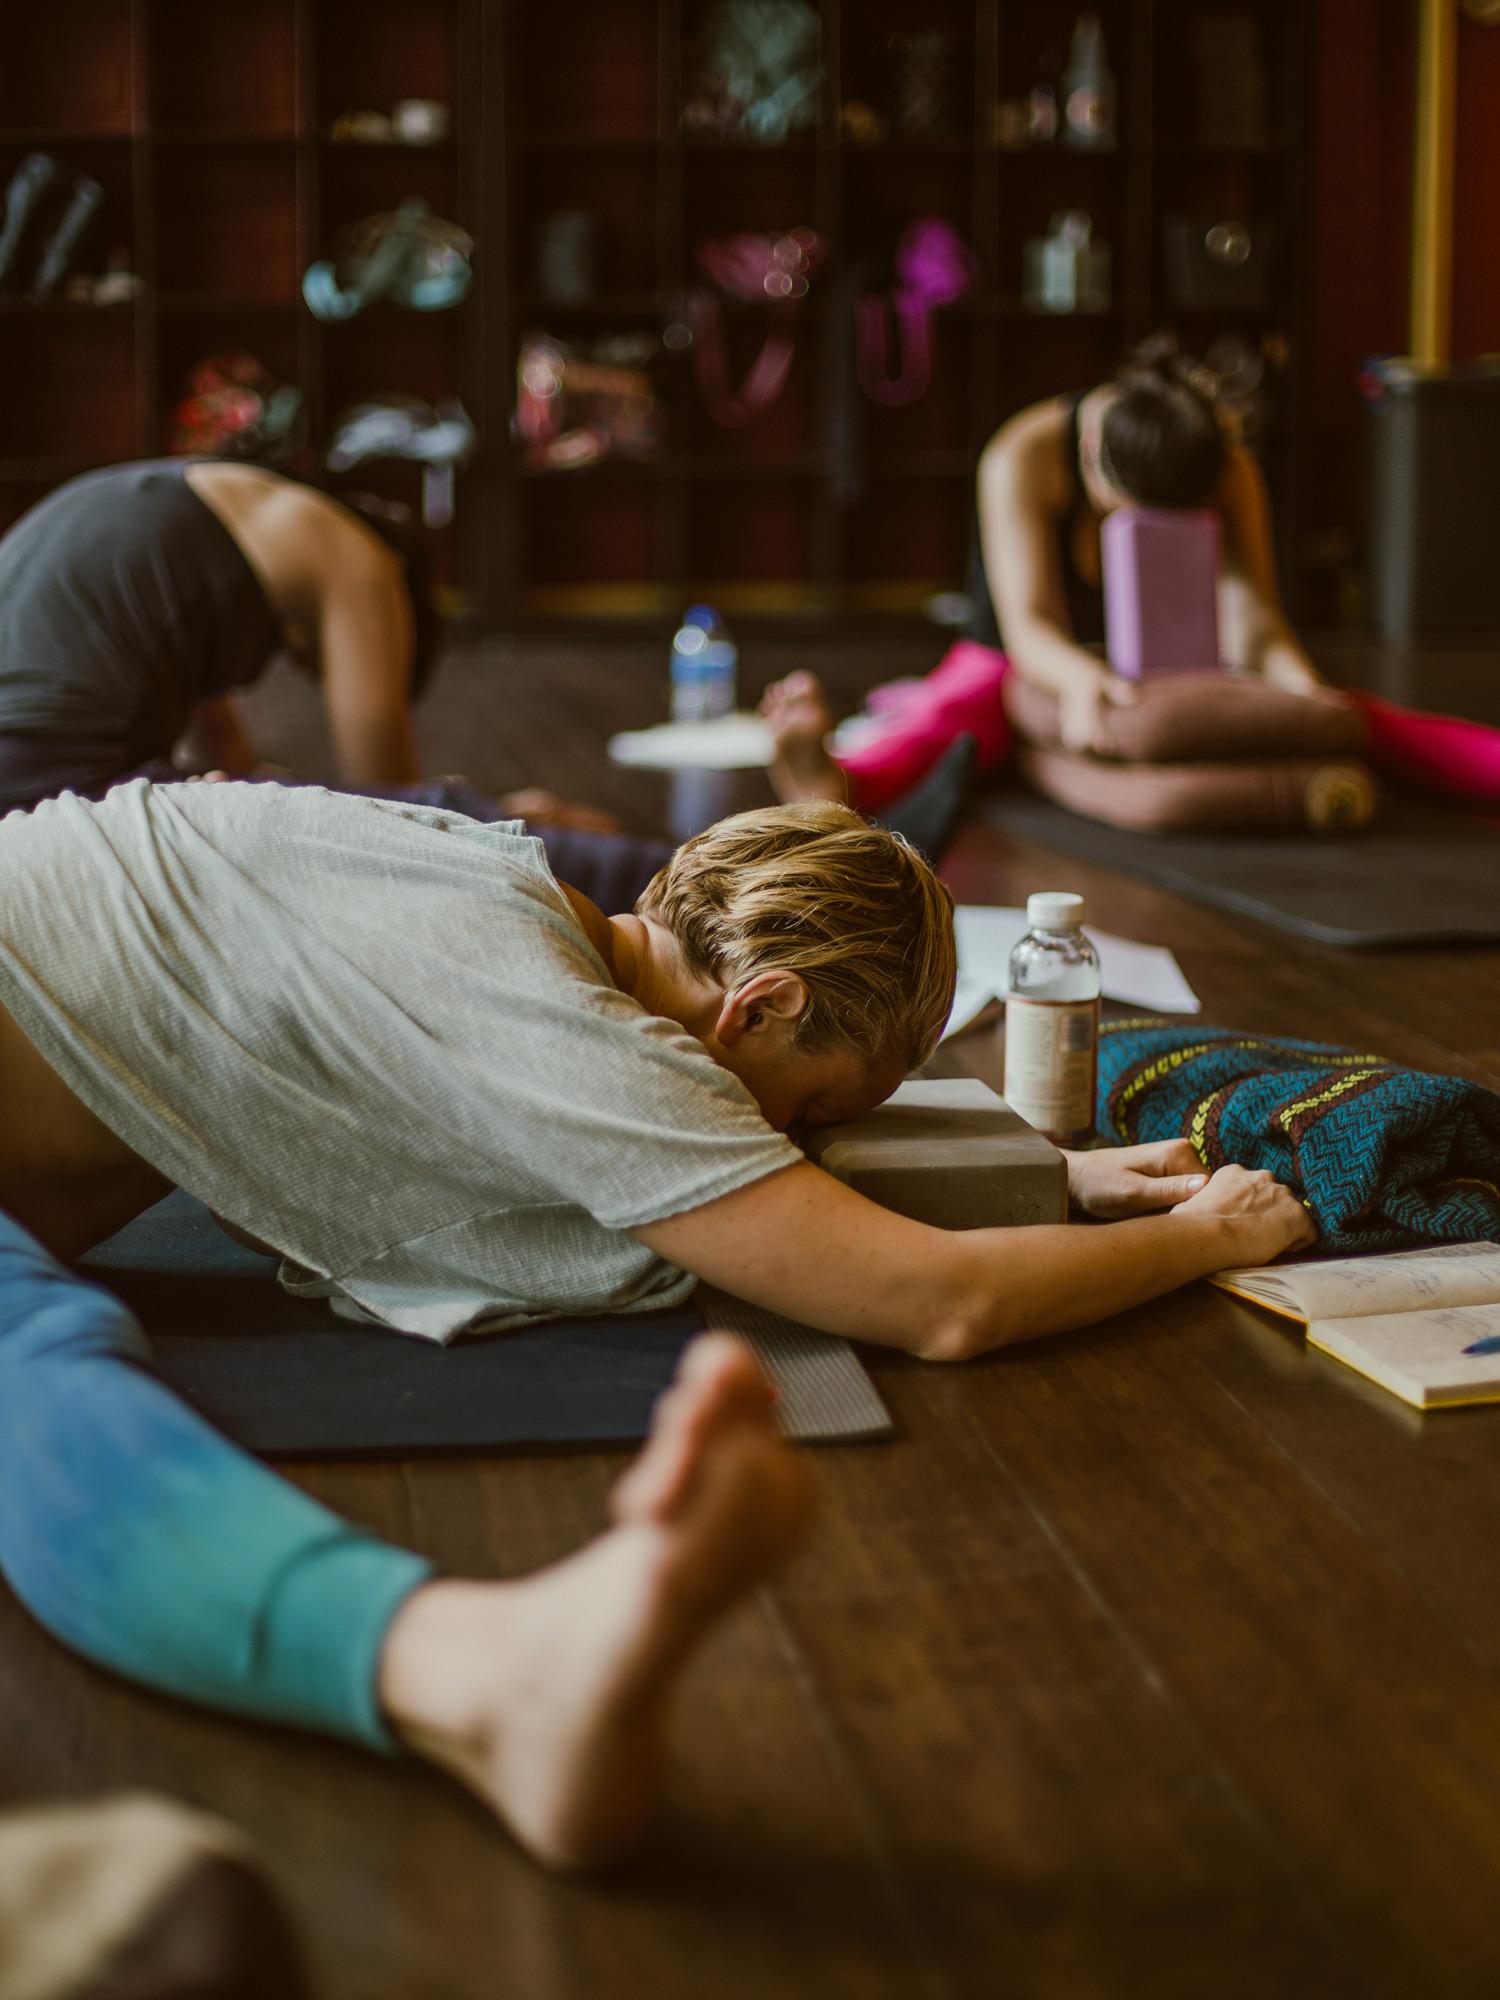 bhakti-2018-yin-yoga-teacher-training-21.jpg